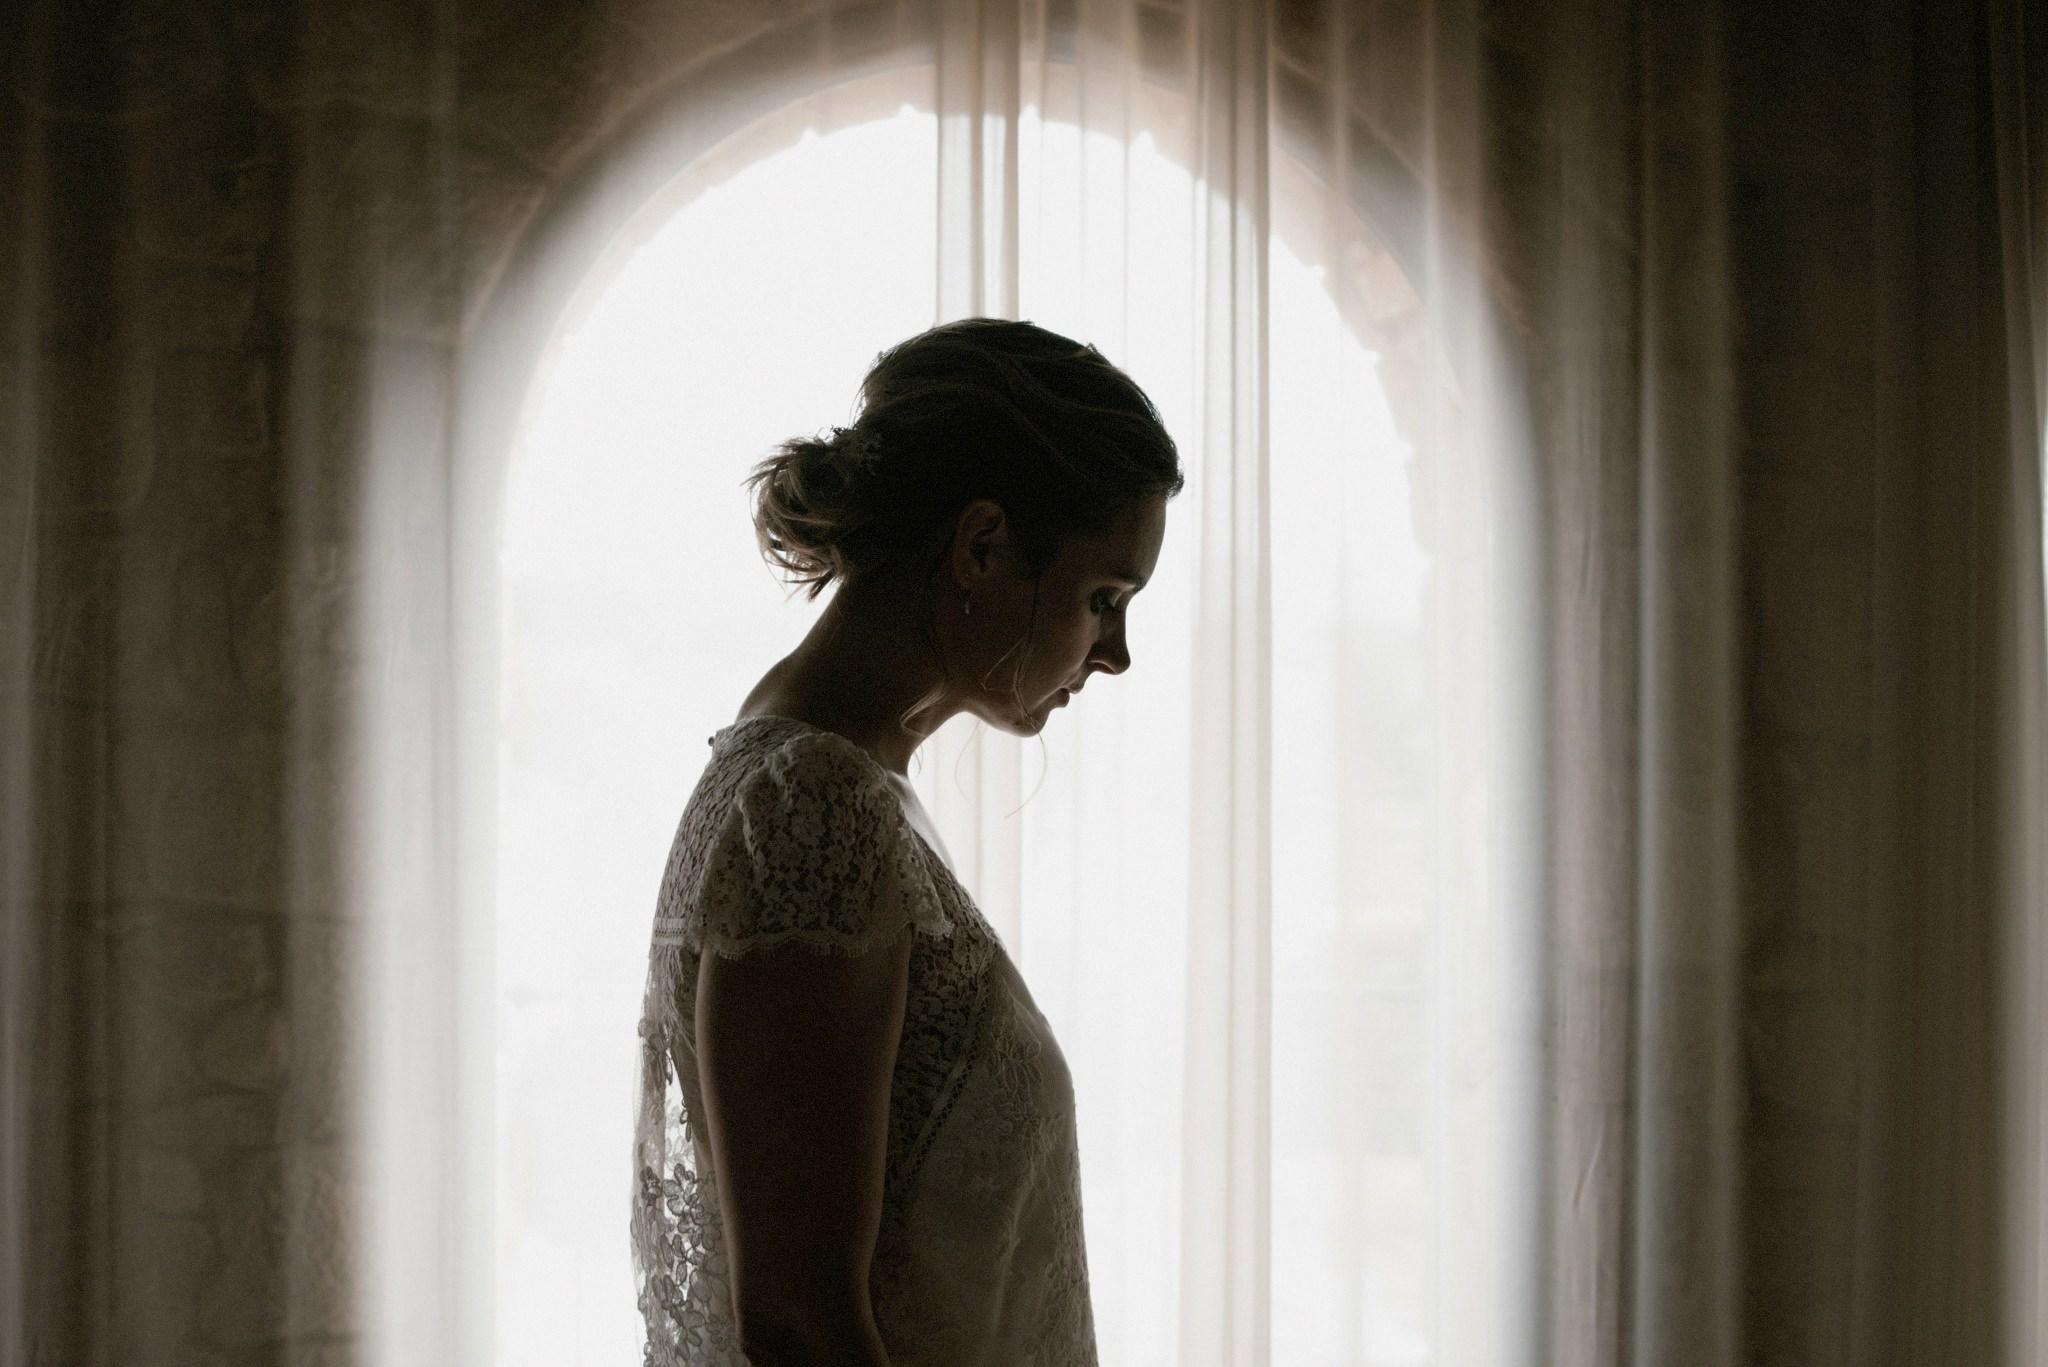 Bruidsfotograaf Spanje Castle d'Emporda destination wedding Naomi van der Kraan00018.jpg